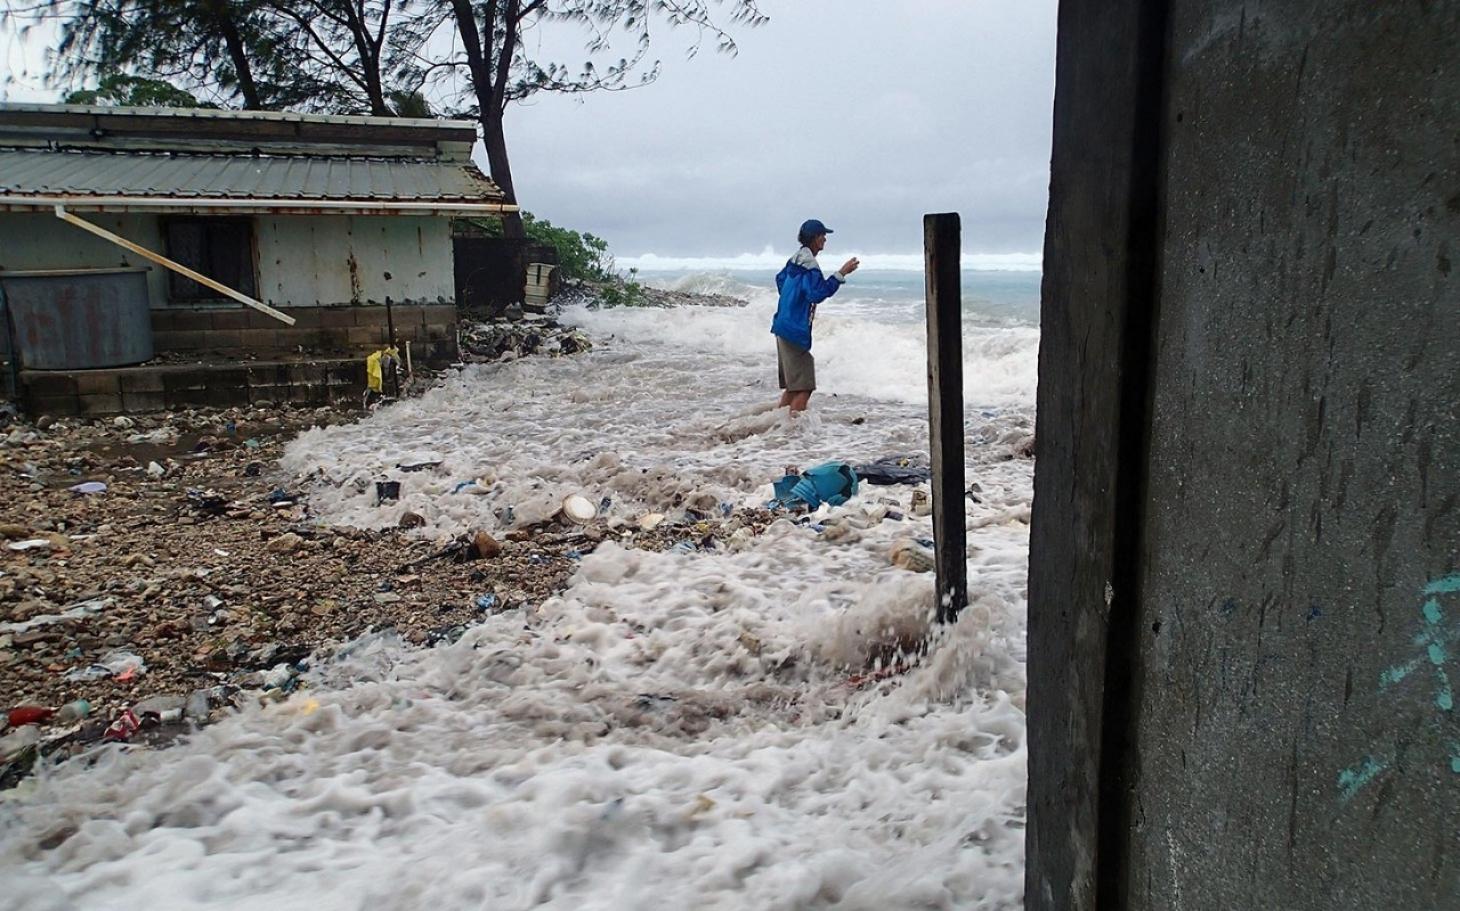 Marshall Mobile Homes >> Marshall Islands flooding blamed on climate change | Al Jazeera America